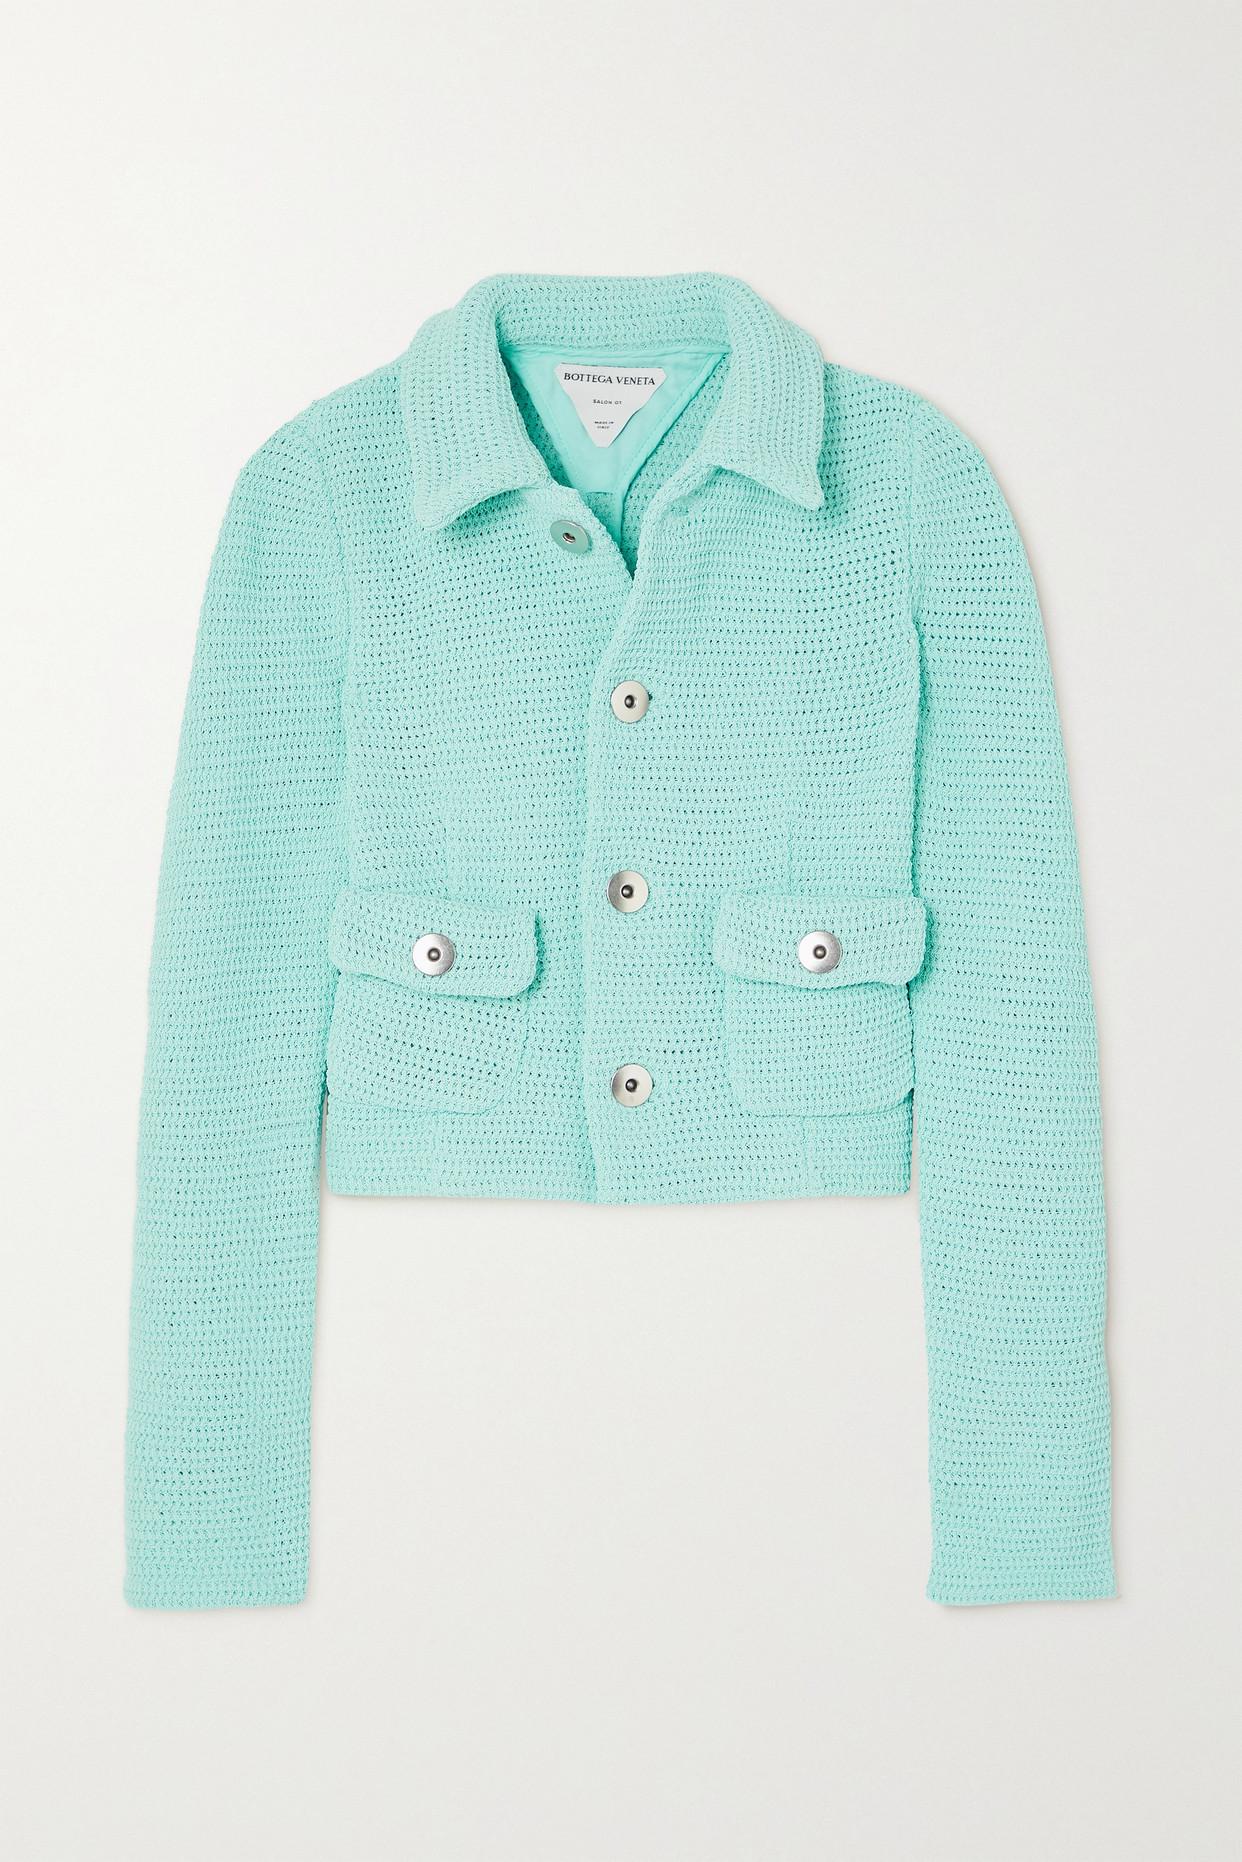 BOTTEGA VENETA - Cropped Open-knit Cotton-blend Jacket - Blue - IT38